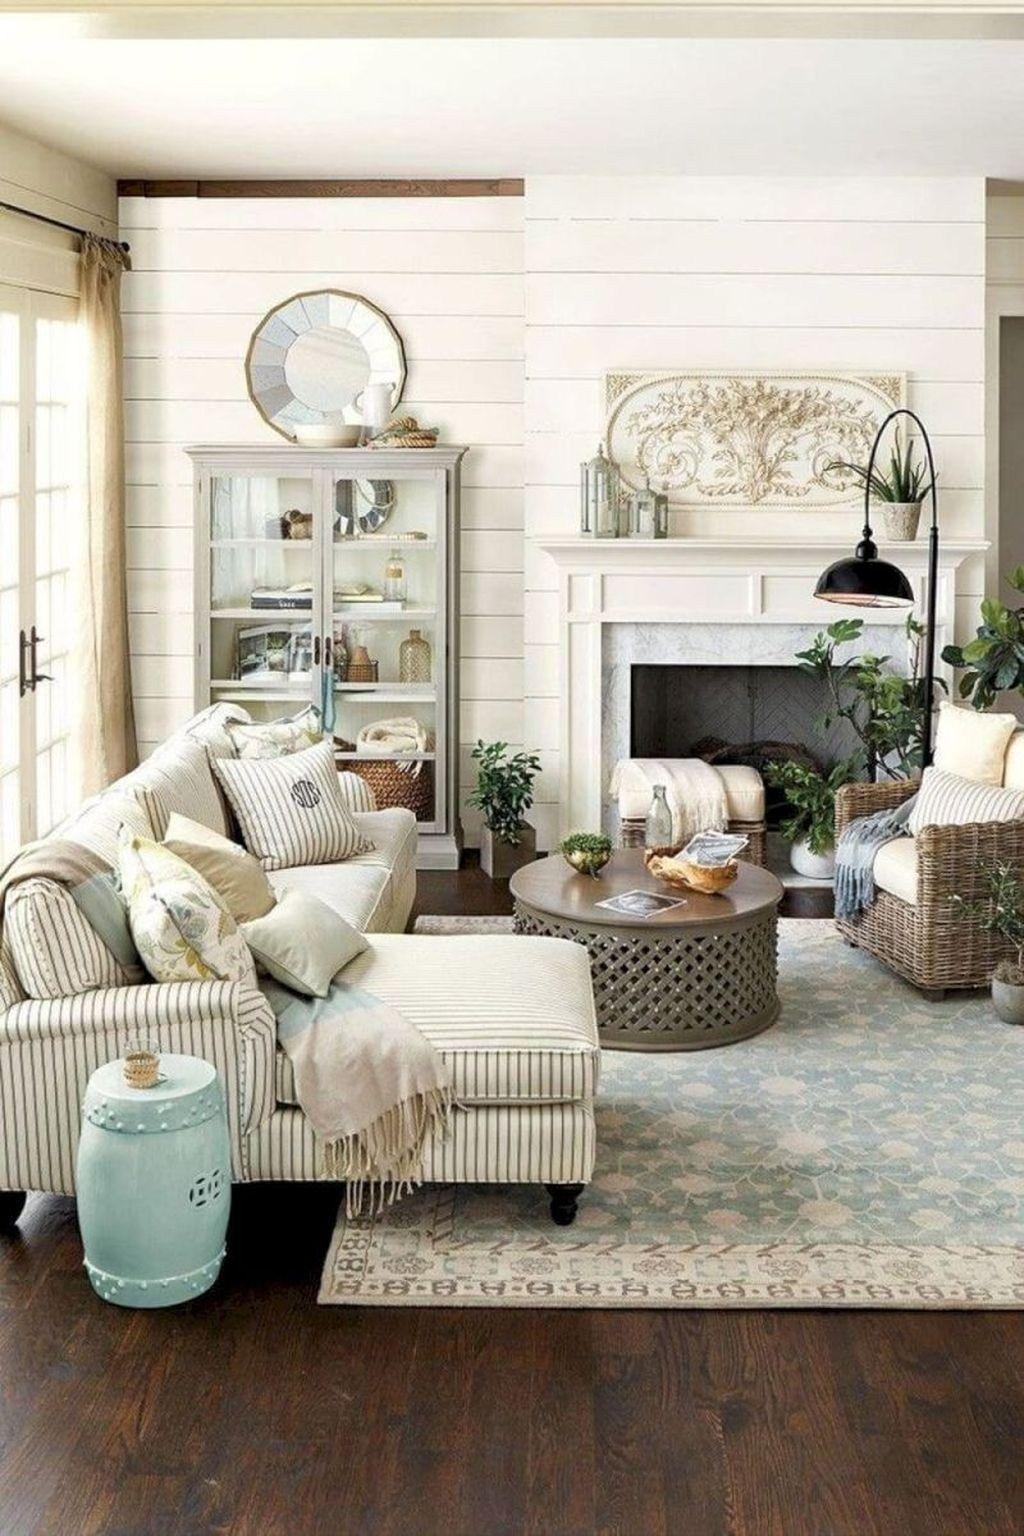 Einfache heimkino raumgestaltung rustic farmhouse living room decor ideas   home in